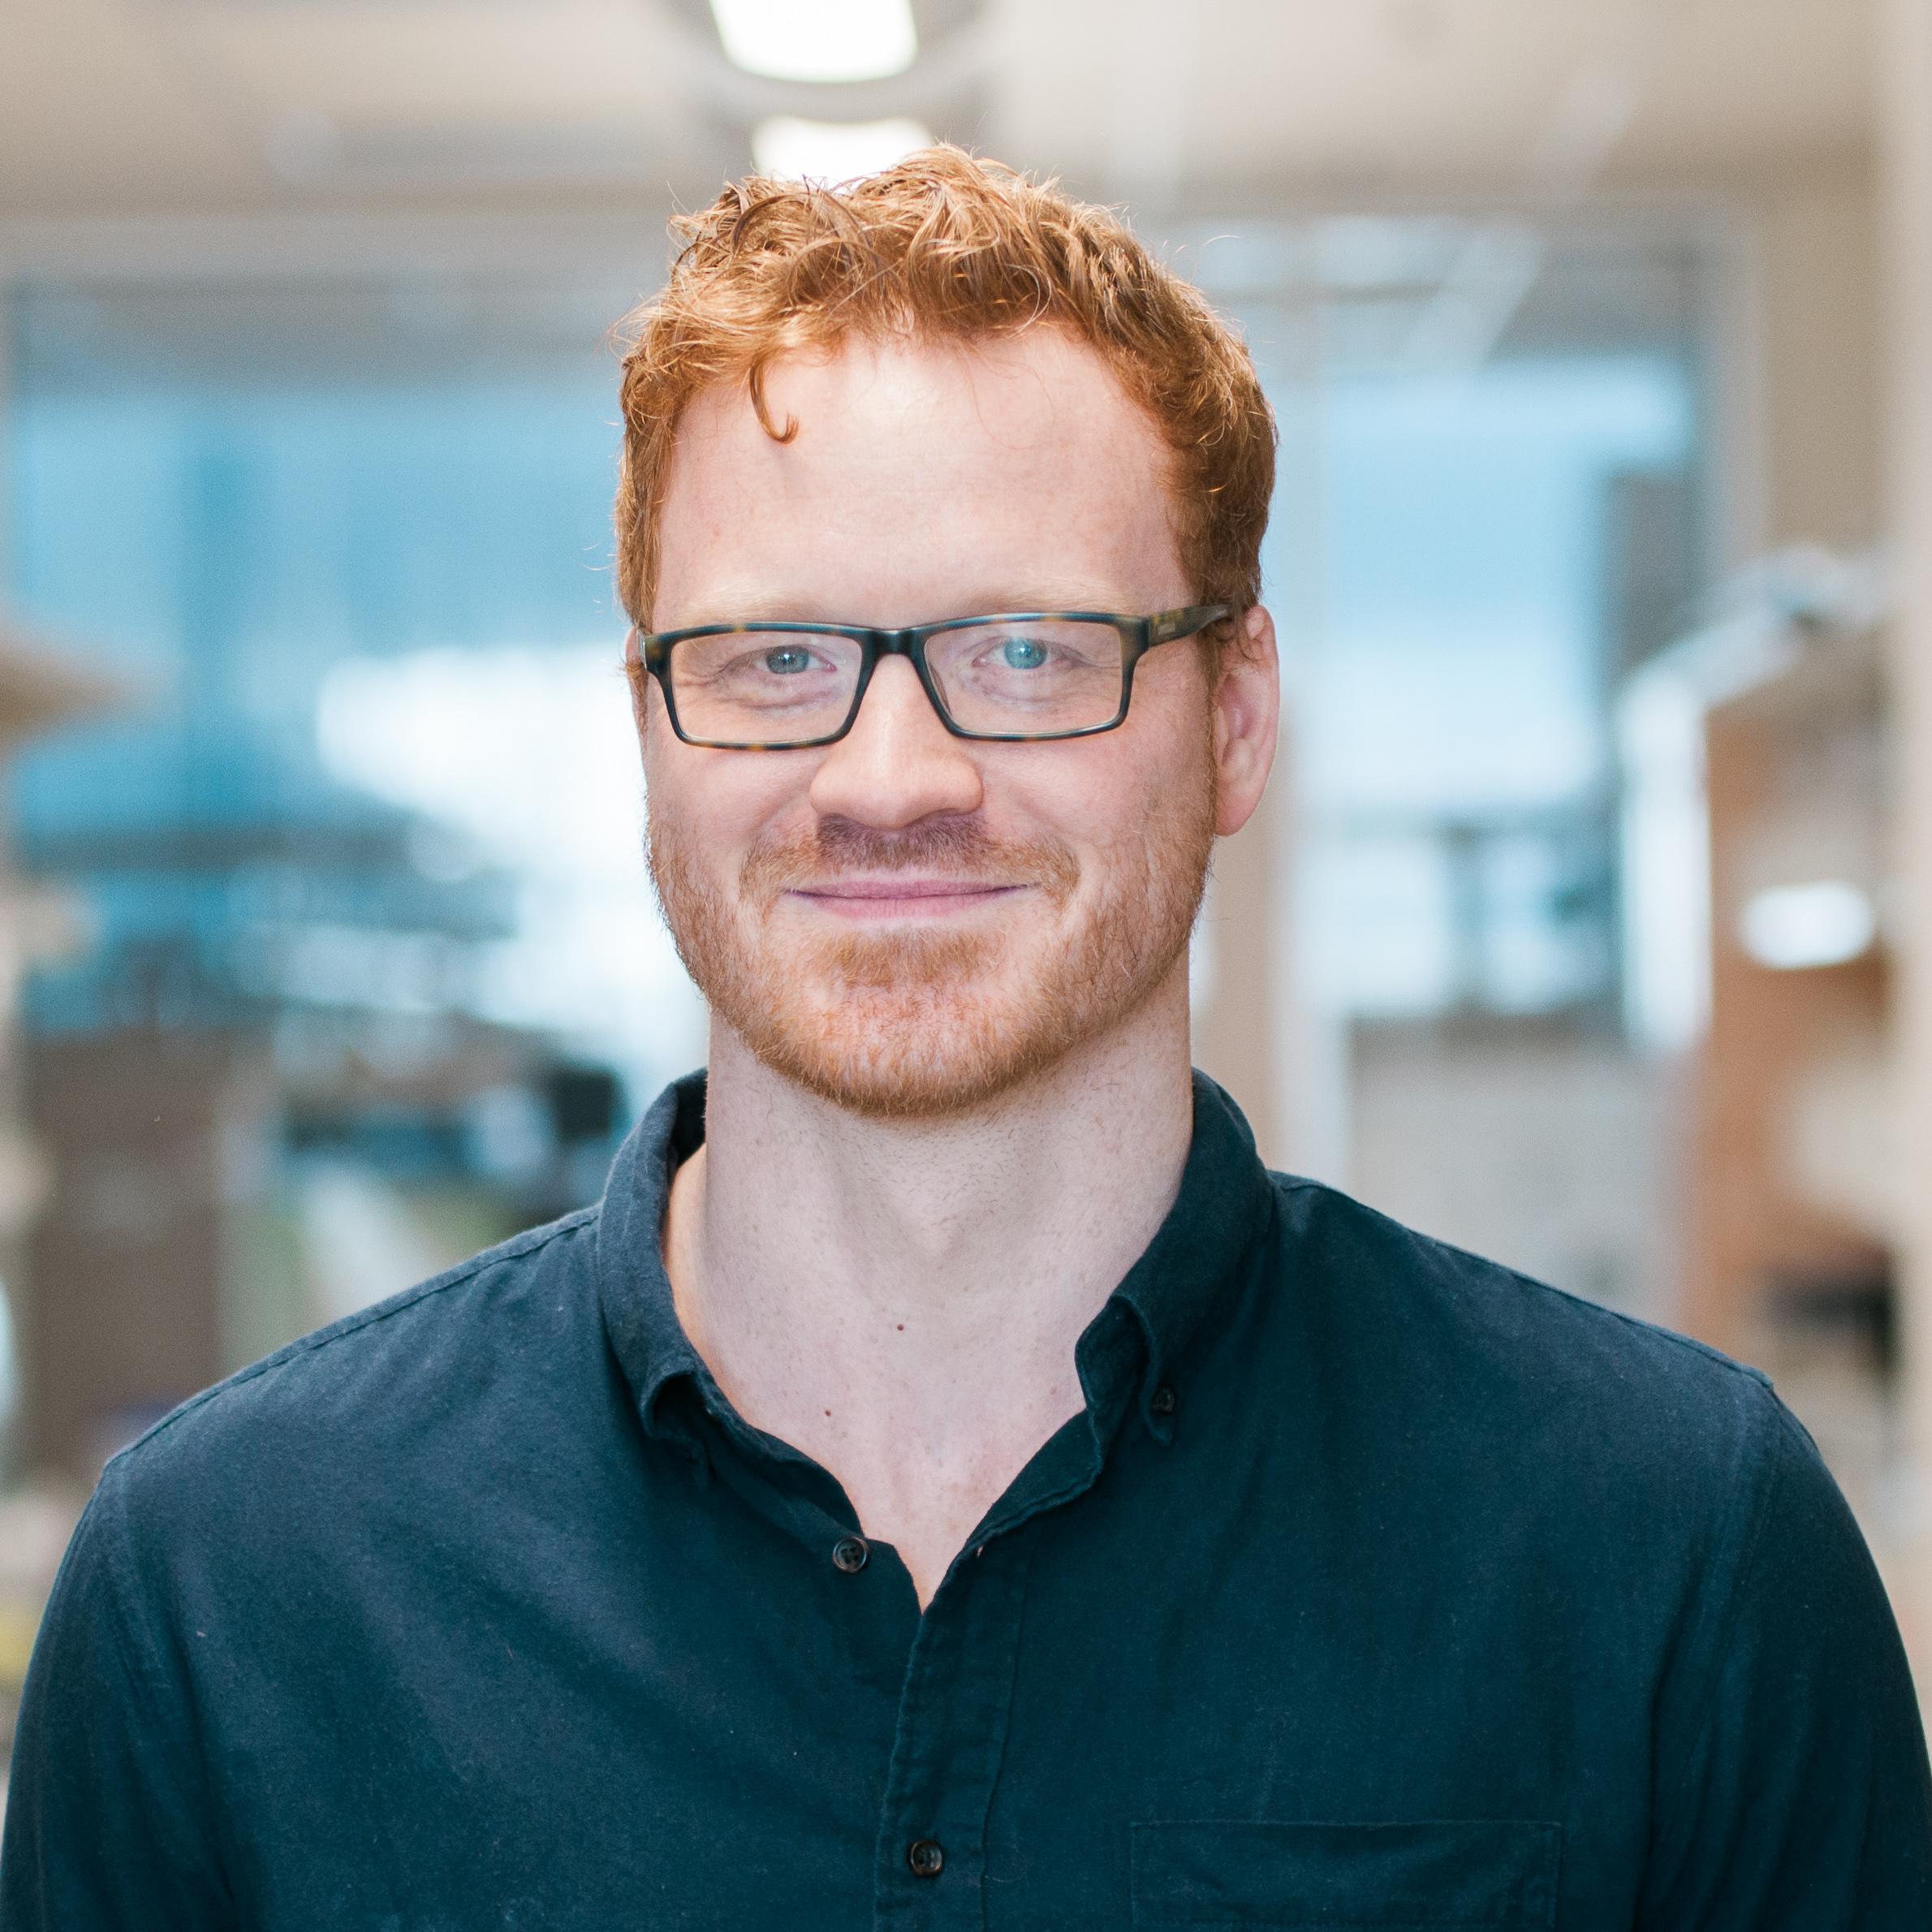 Robert Thänert, Dr. rer. nat. robertt [at] wustl.edu